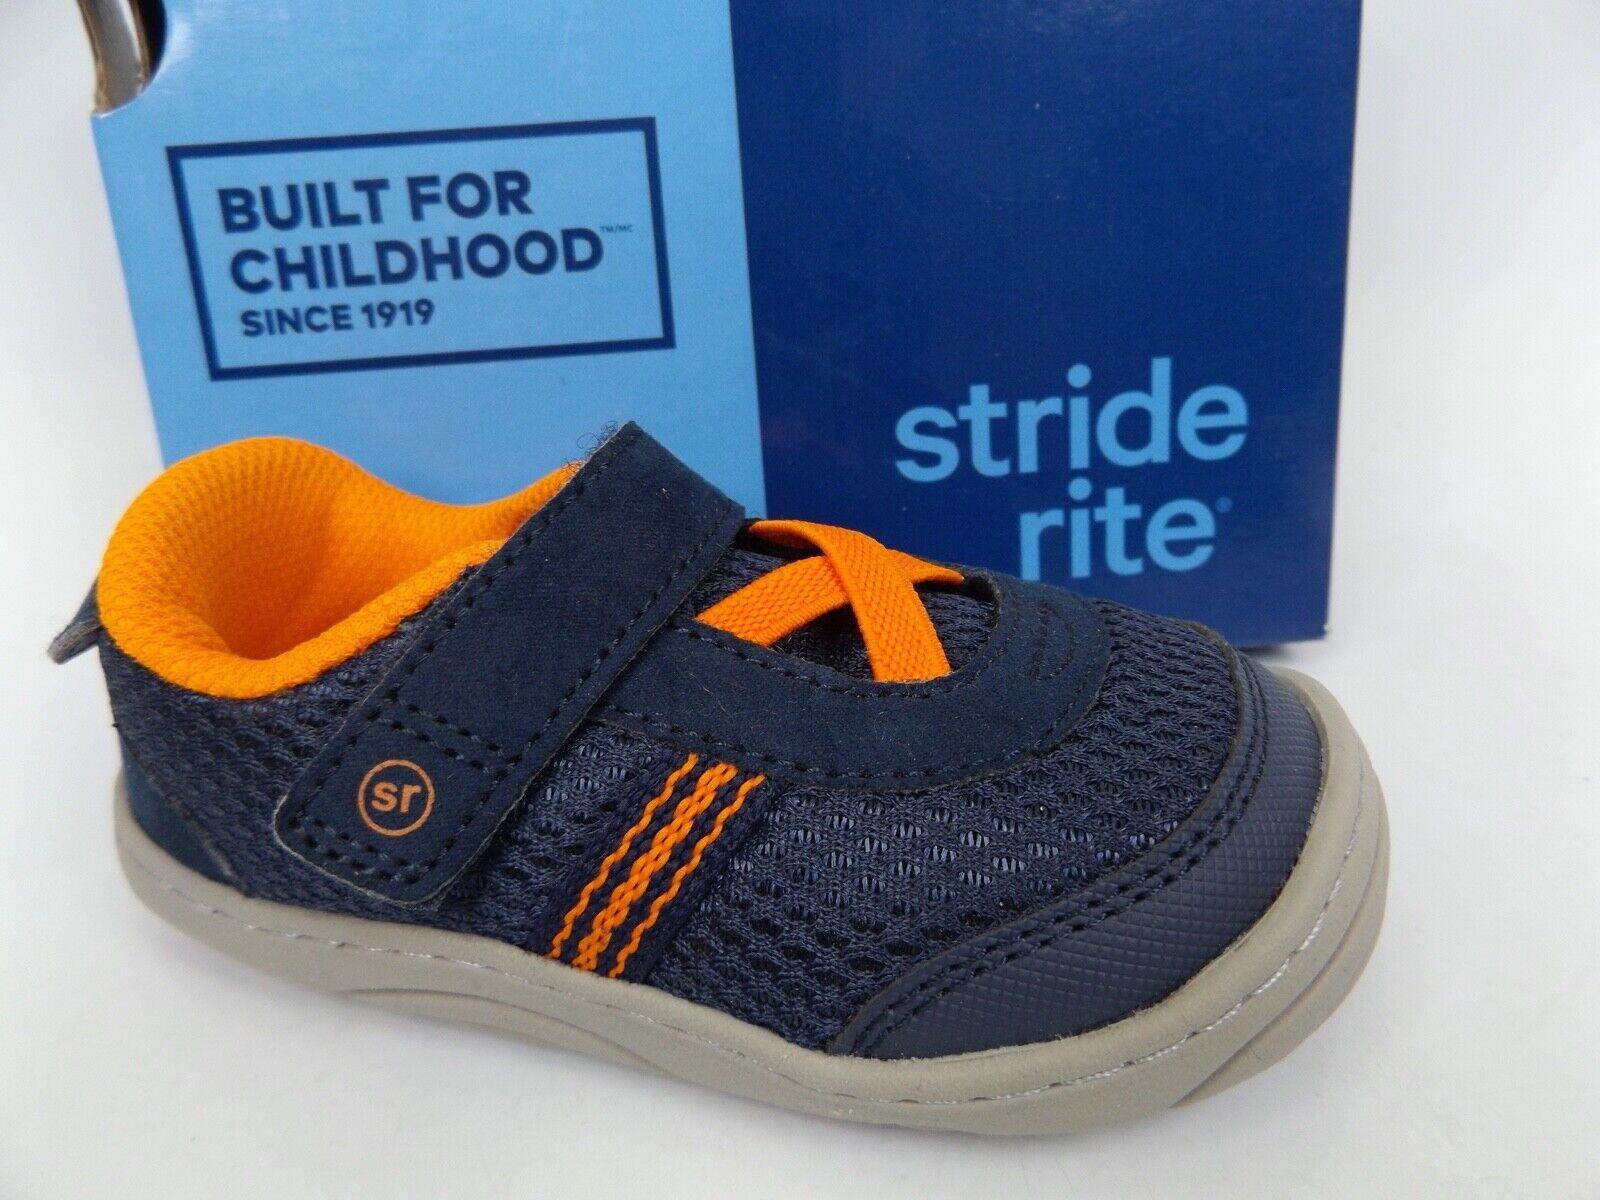 Stride Rite Jackson Sneakers, Toddler Boy's Shoes SZ 6 M, Na